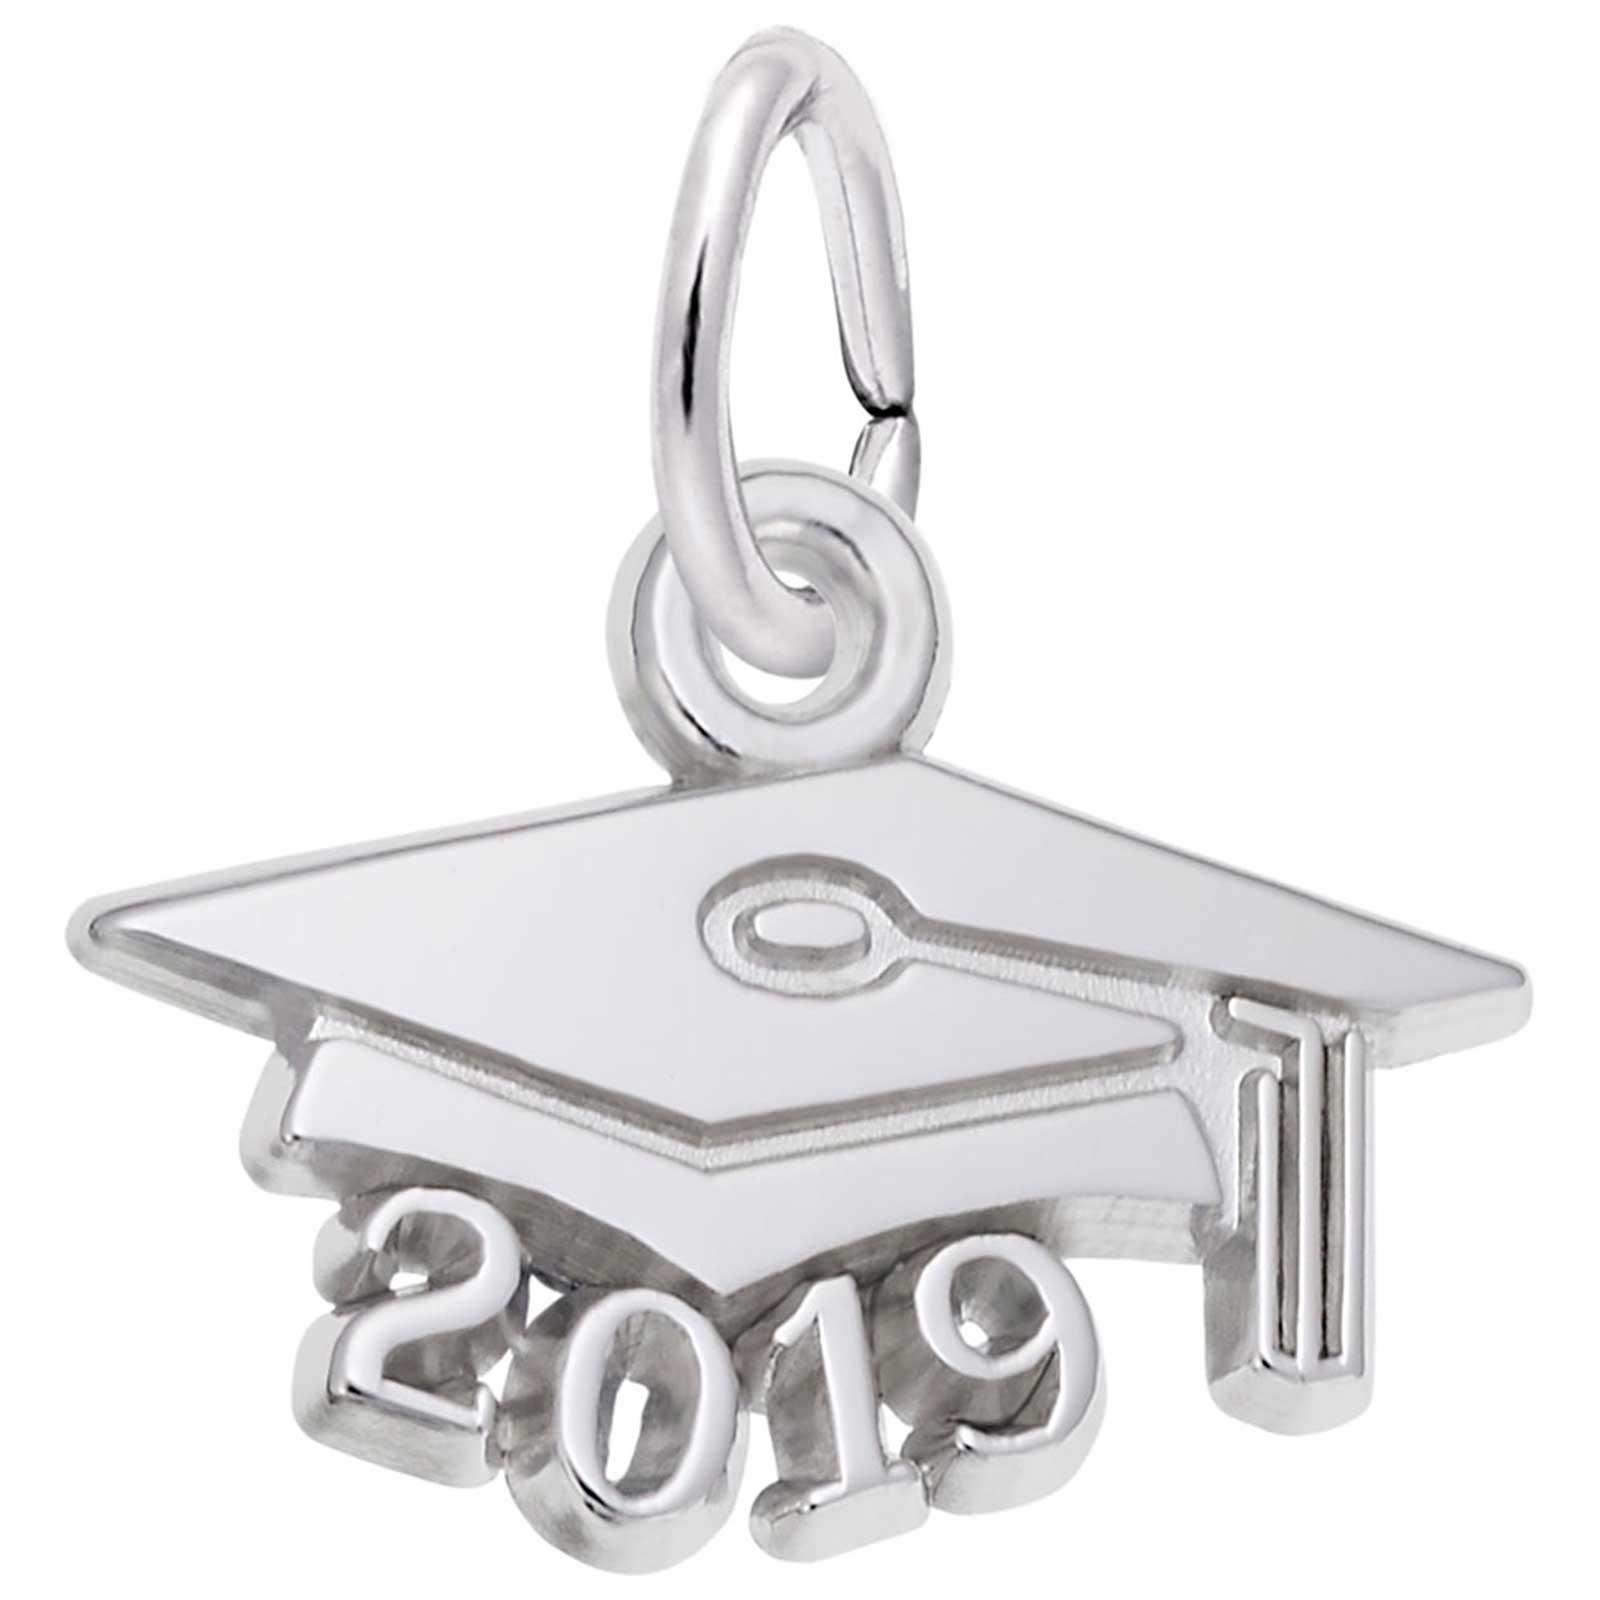 Rembrandt Graduation Cap 2019 Charm Sterling Silver